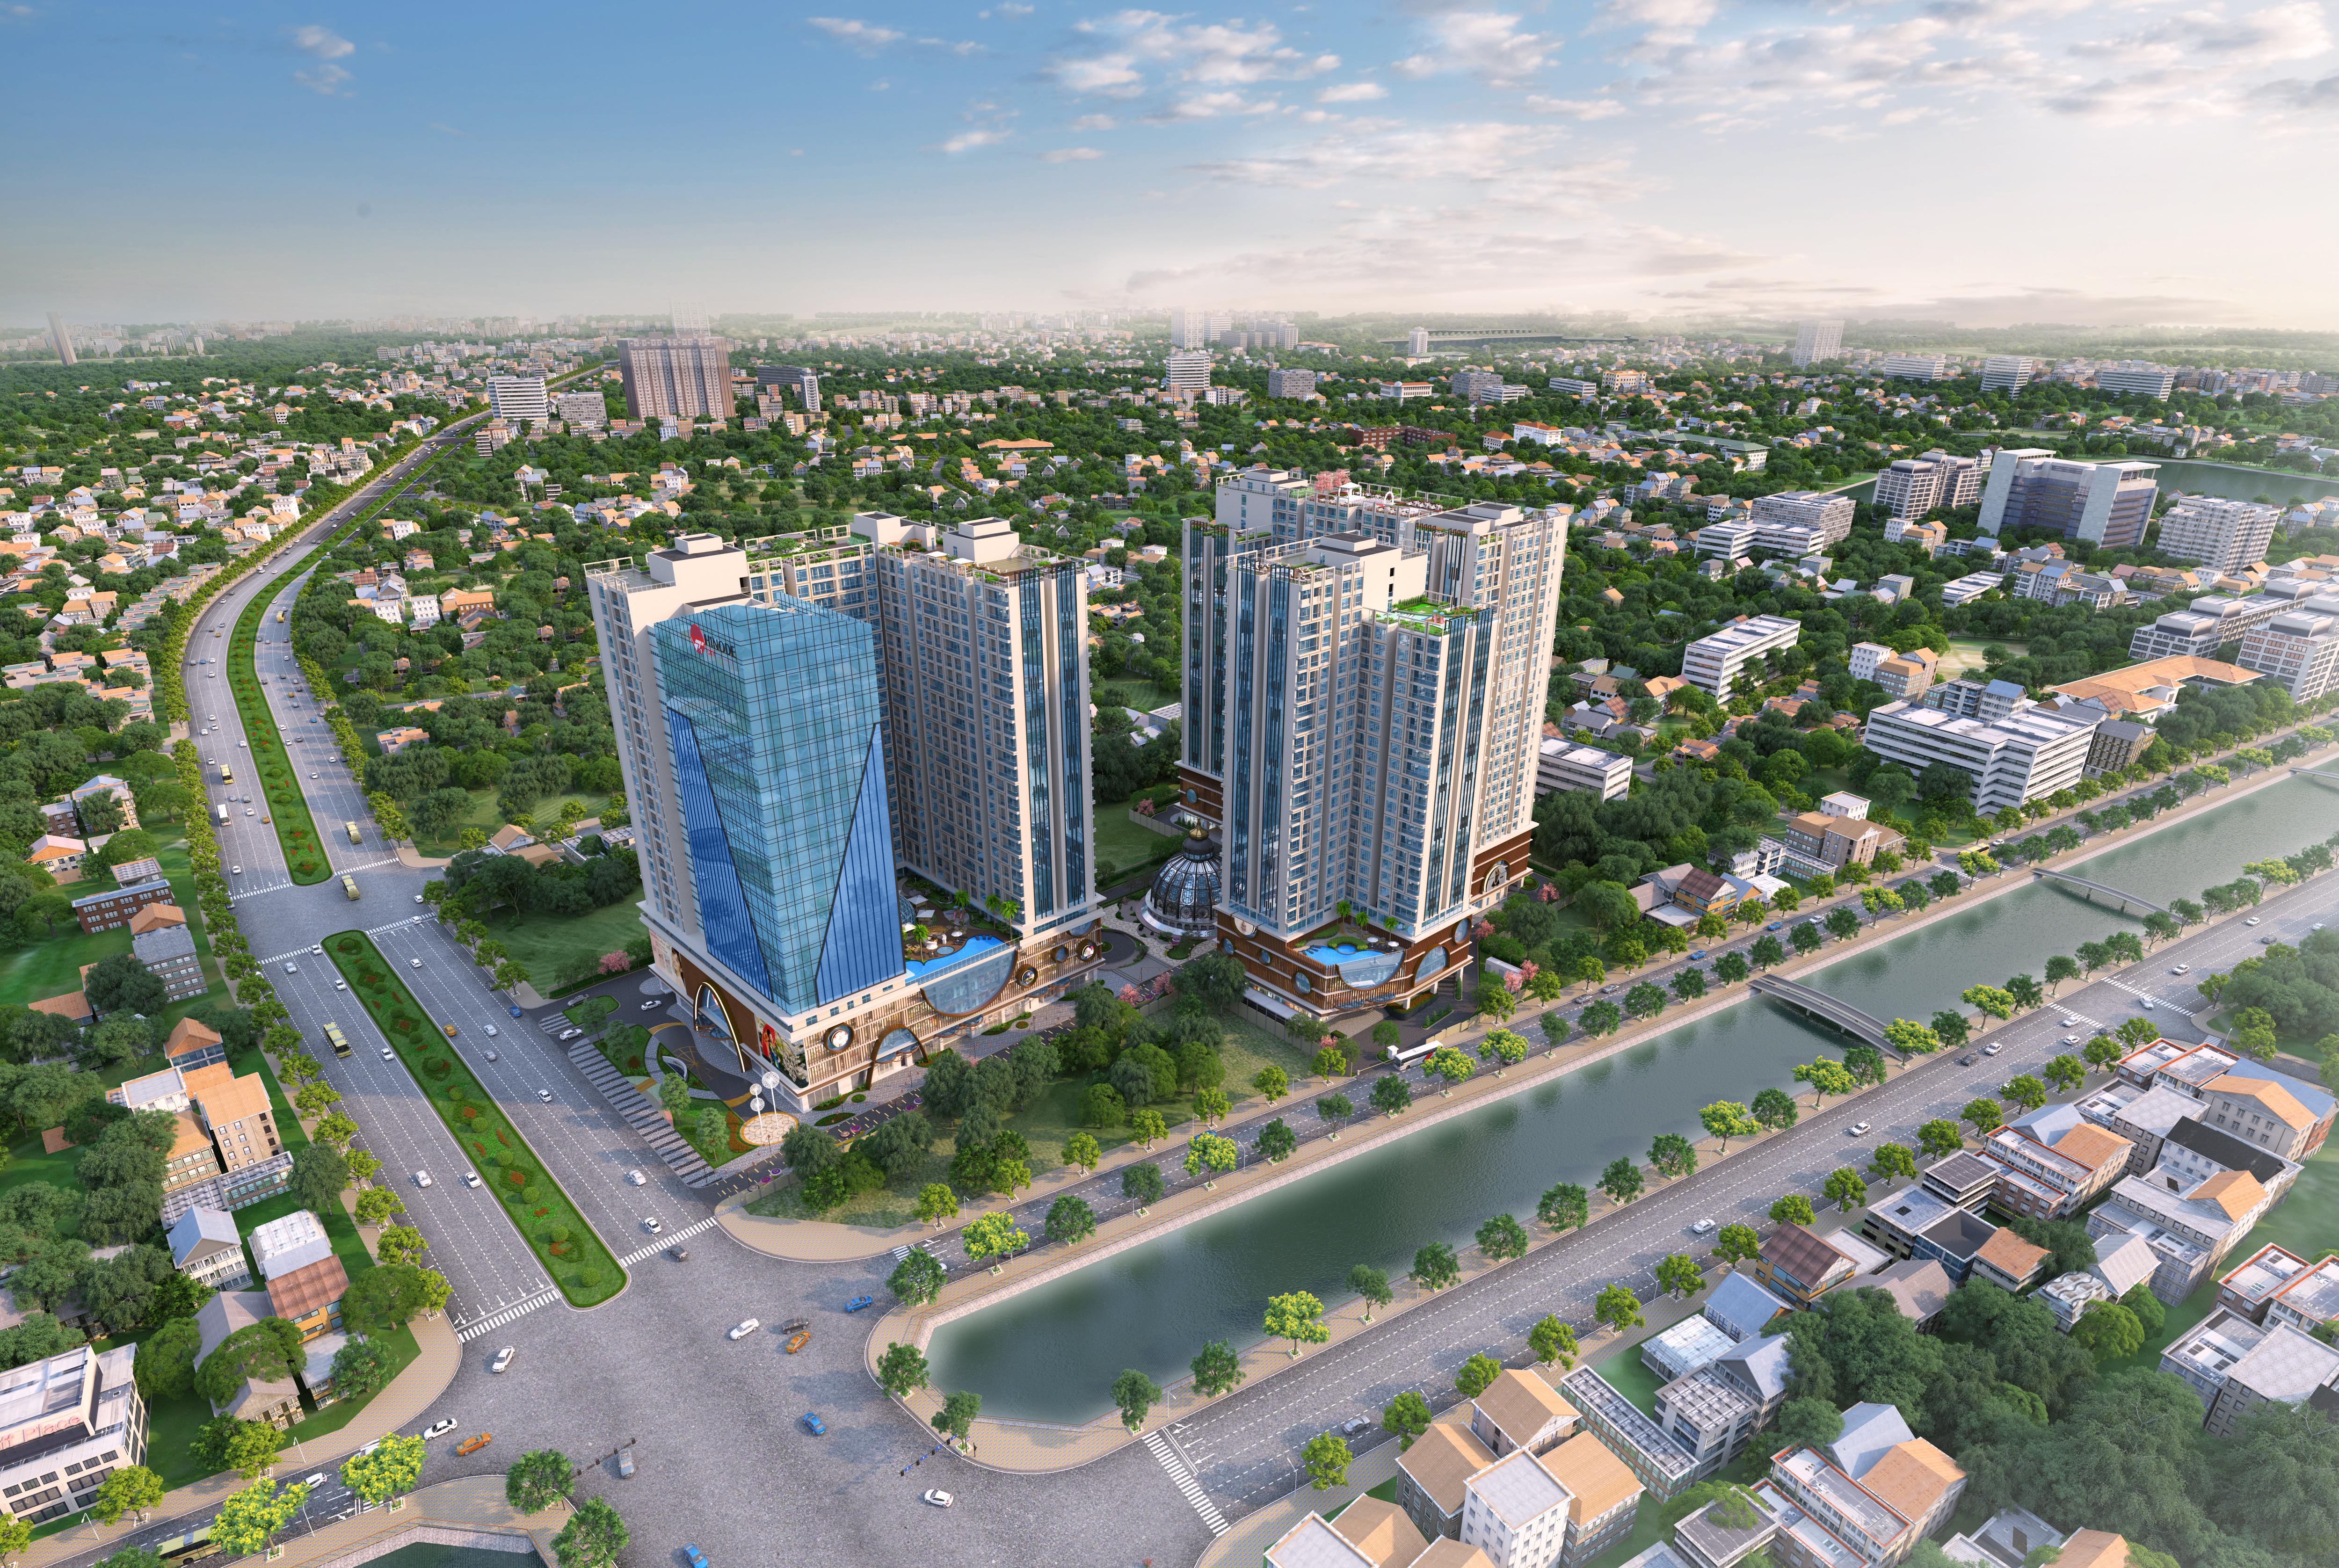 phoi-canh-hinode-city-201-minh-khai-1